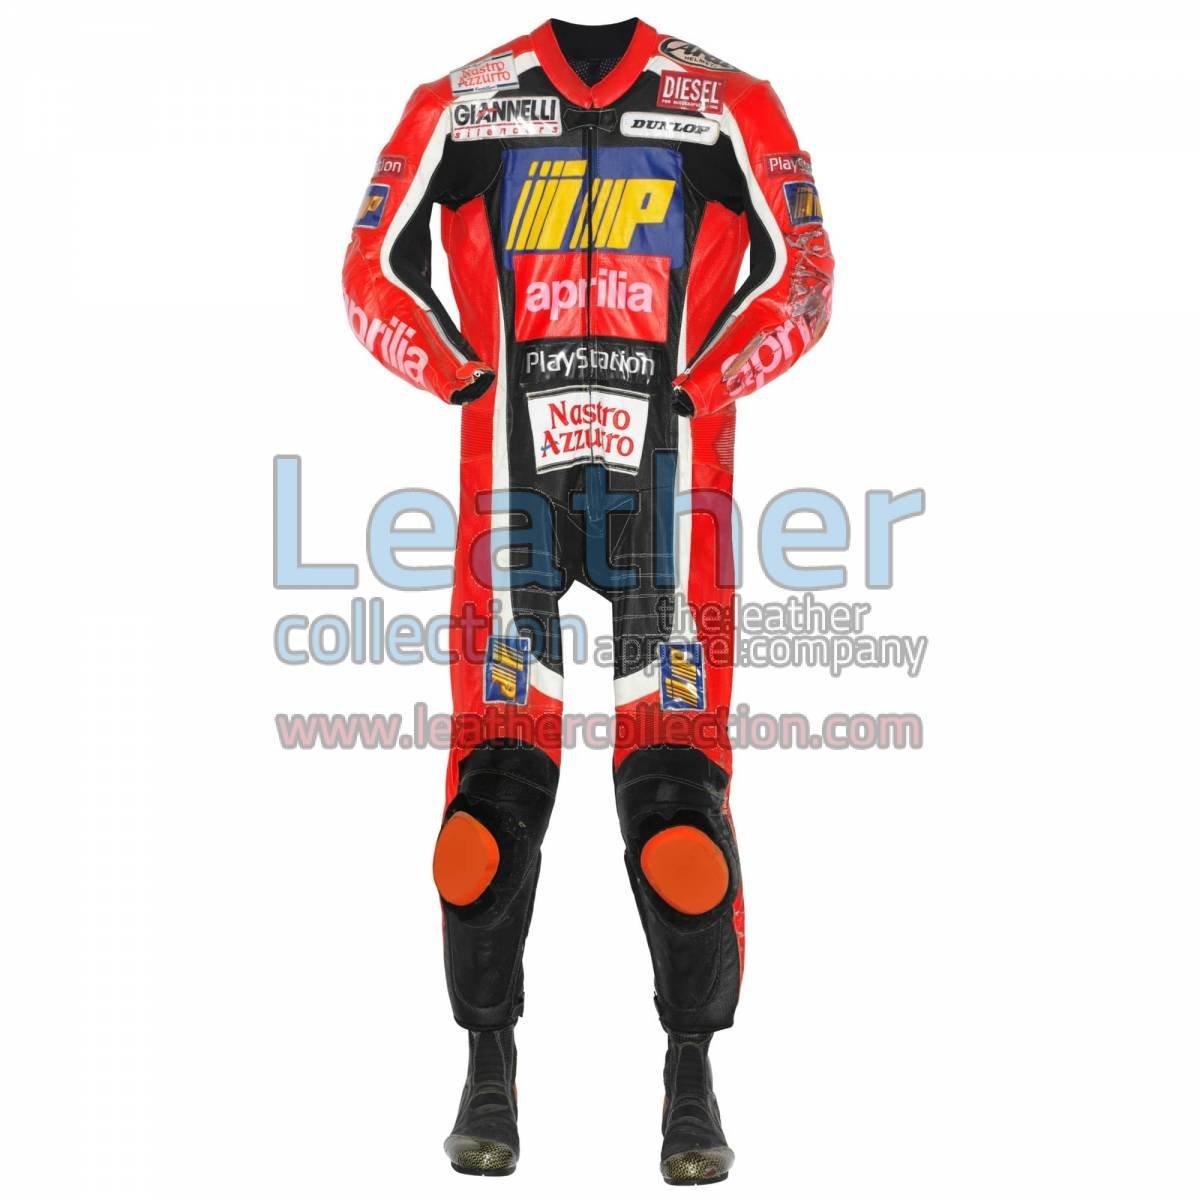 Tetsuya Harada Aprilia GP 1999 Racing Leathers